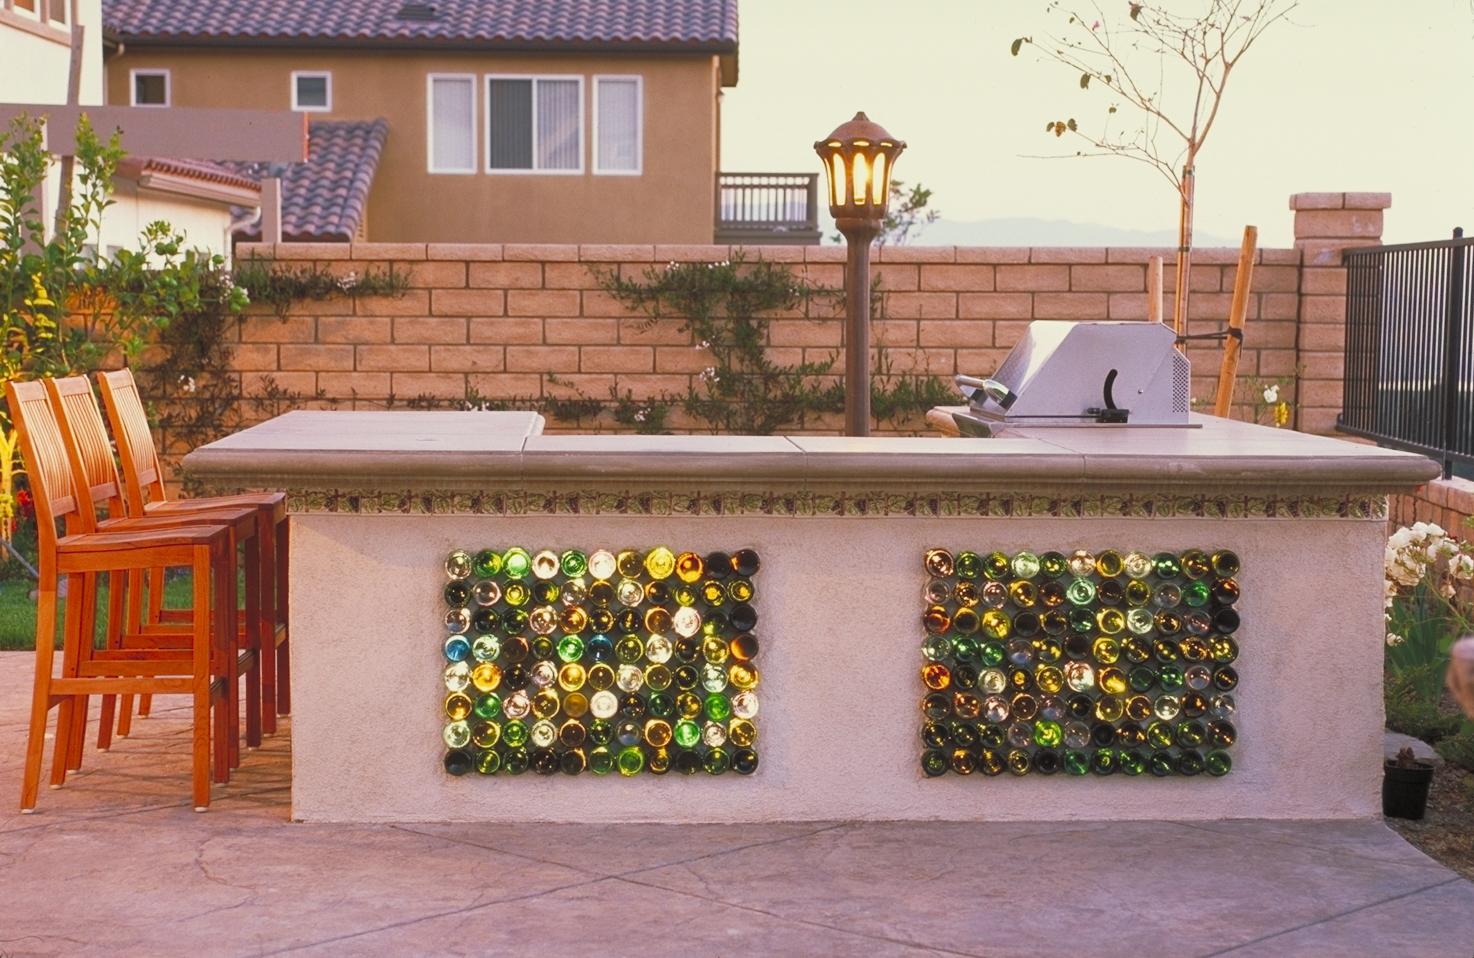 California Garden Artist Creates Stunning Water Features